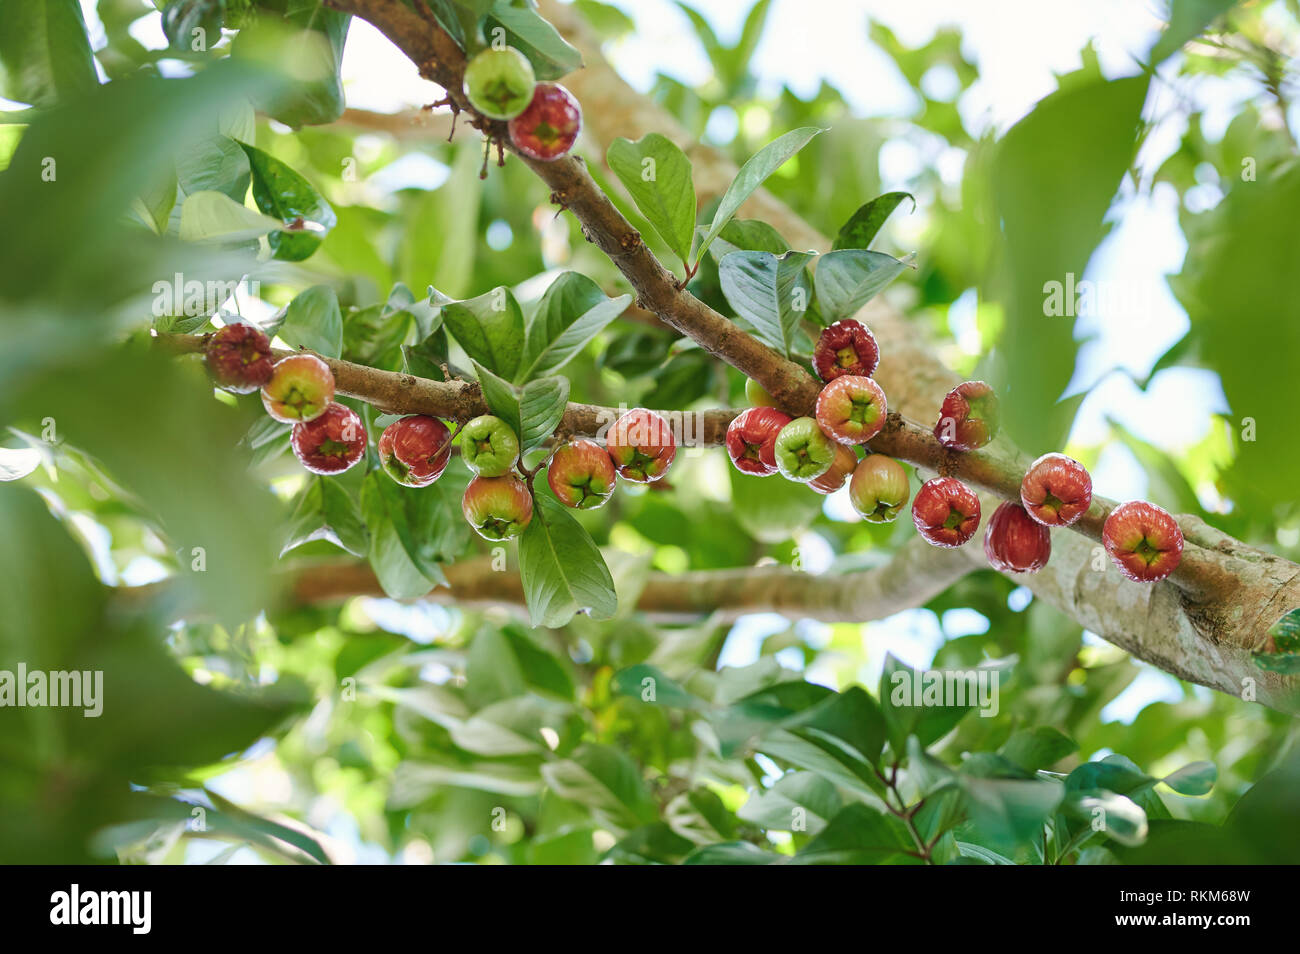 Apple tree branch full of wax apple fruits Stock Photo